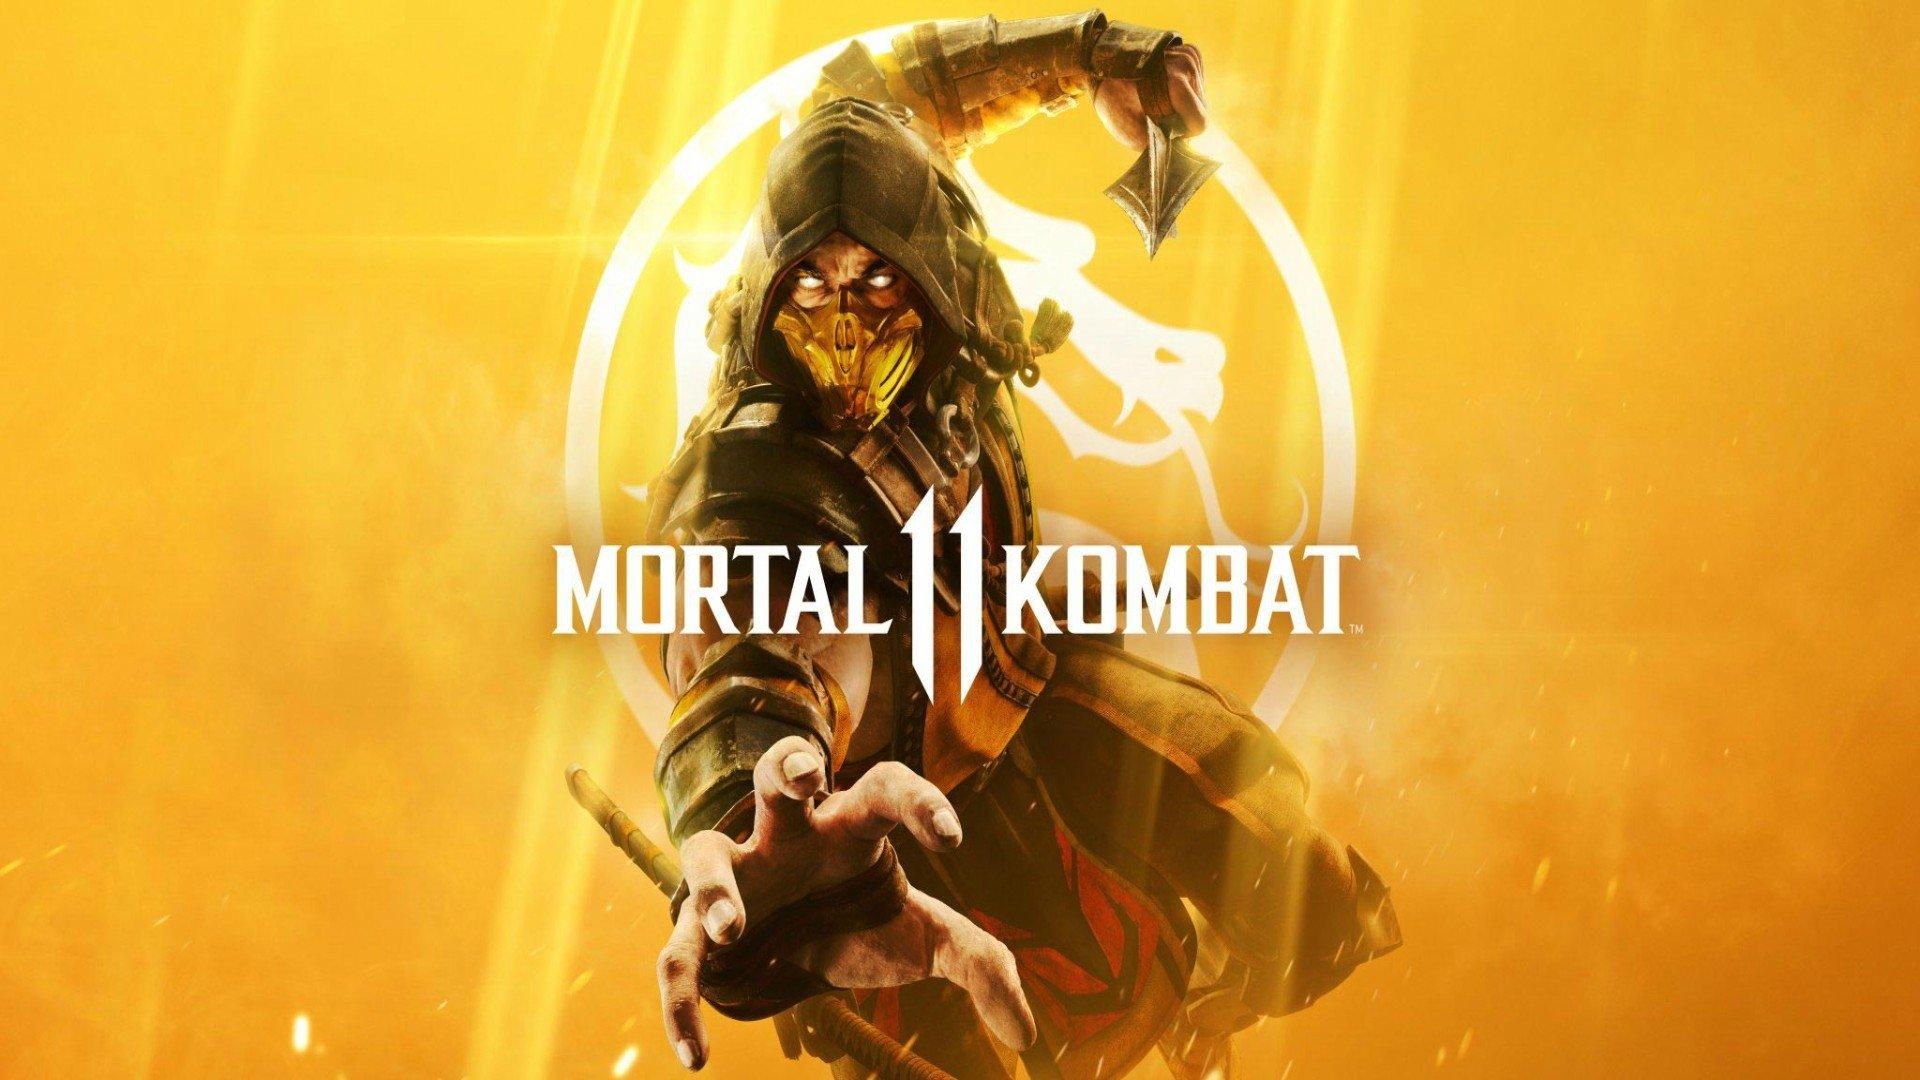 Mk11 Wallpaper: 36 Mortal Kombat 11 HD Wallpapers